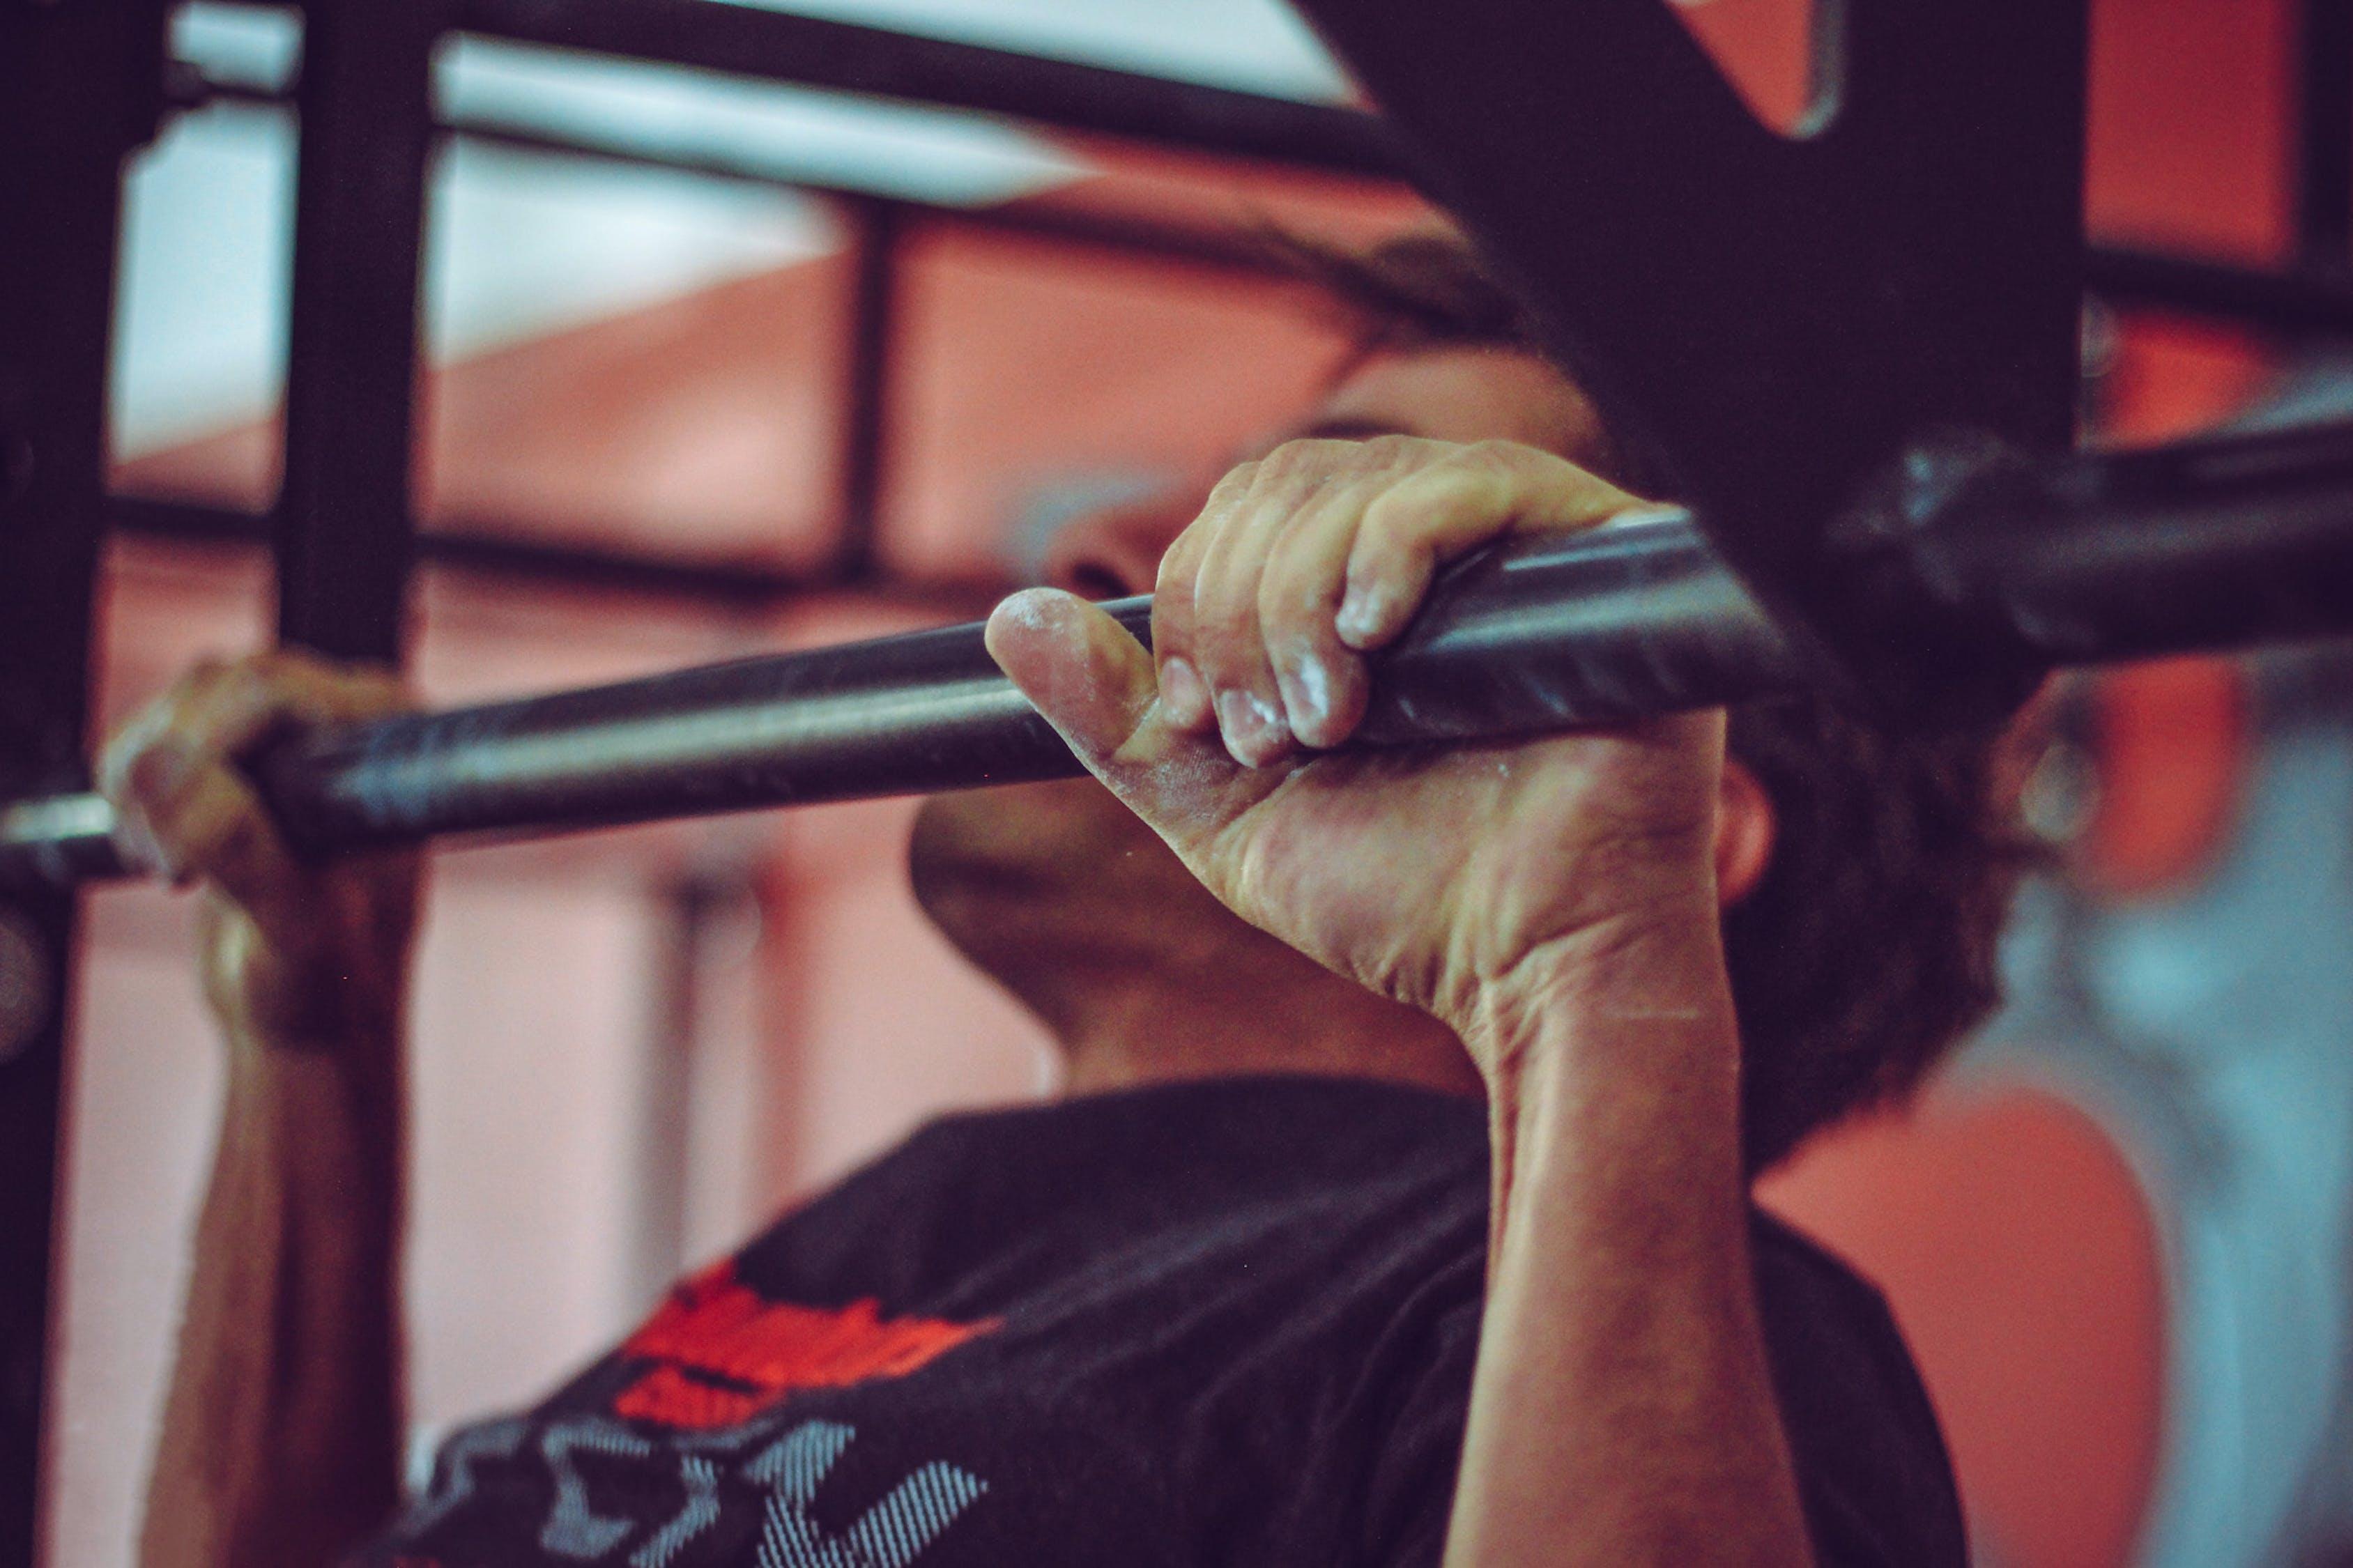 Man In Black Crew-neck Shirt Doing Pull-ups